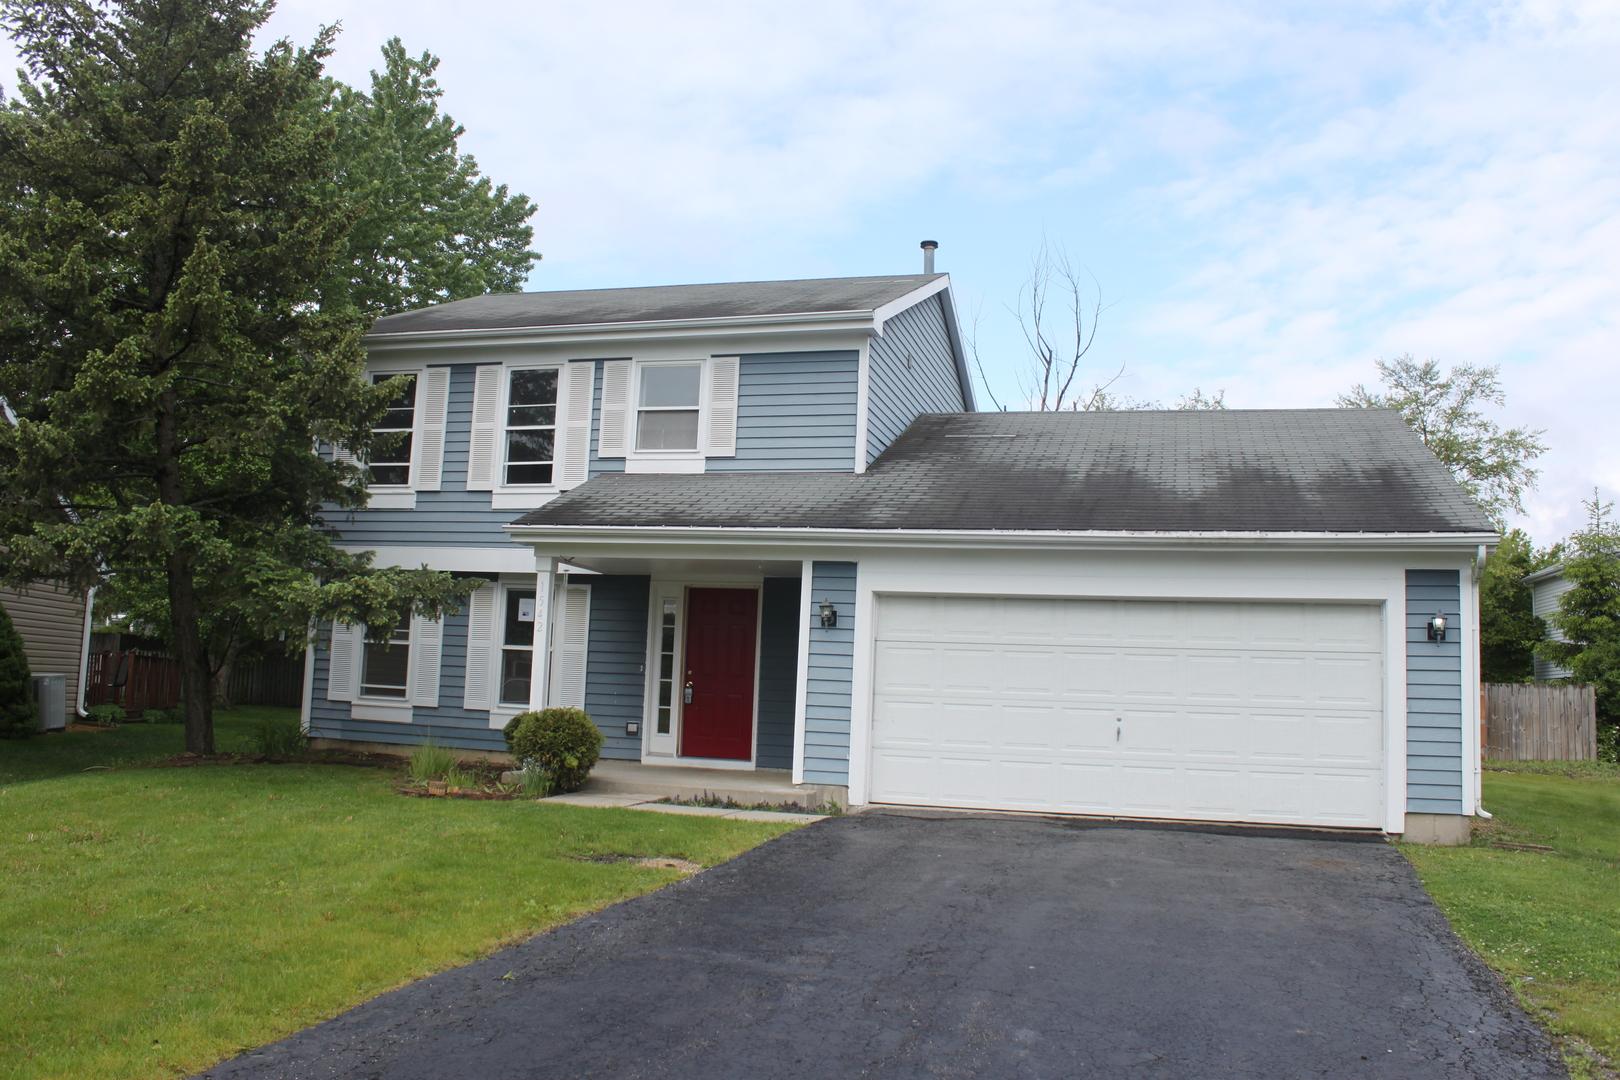 Cul de Sac property for sale at 1542 HOLLYTREE Lane, Crystal Lake Illinois 60014